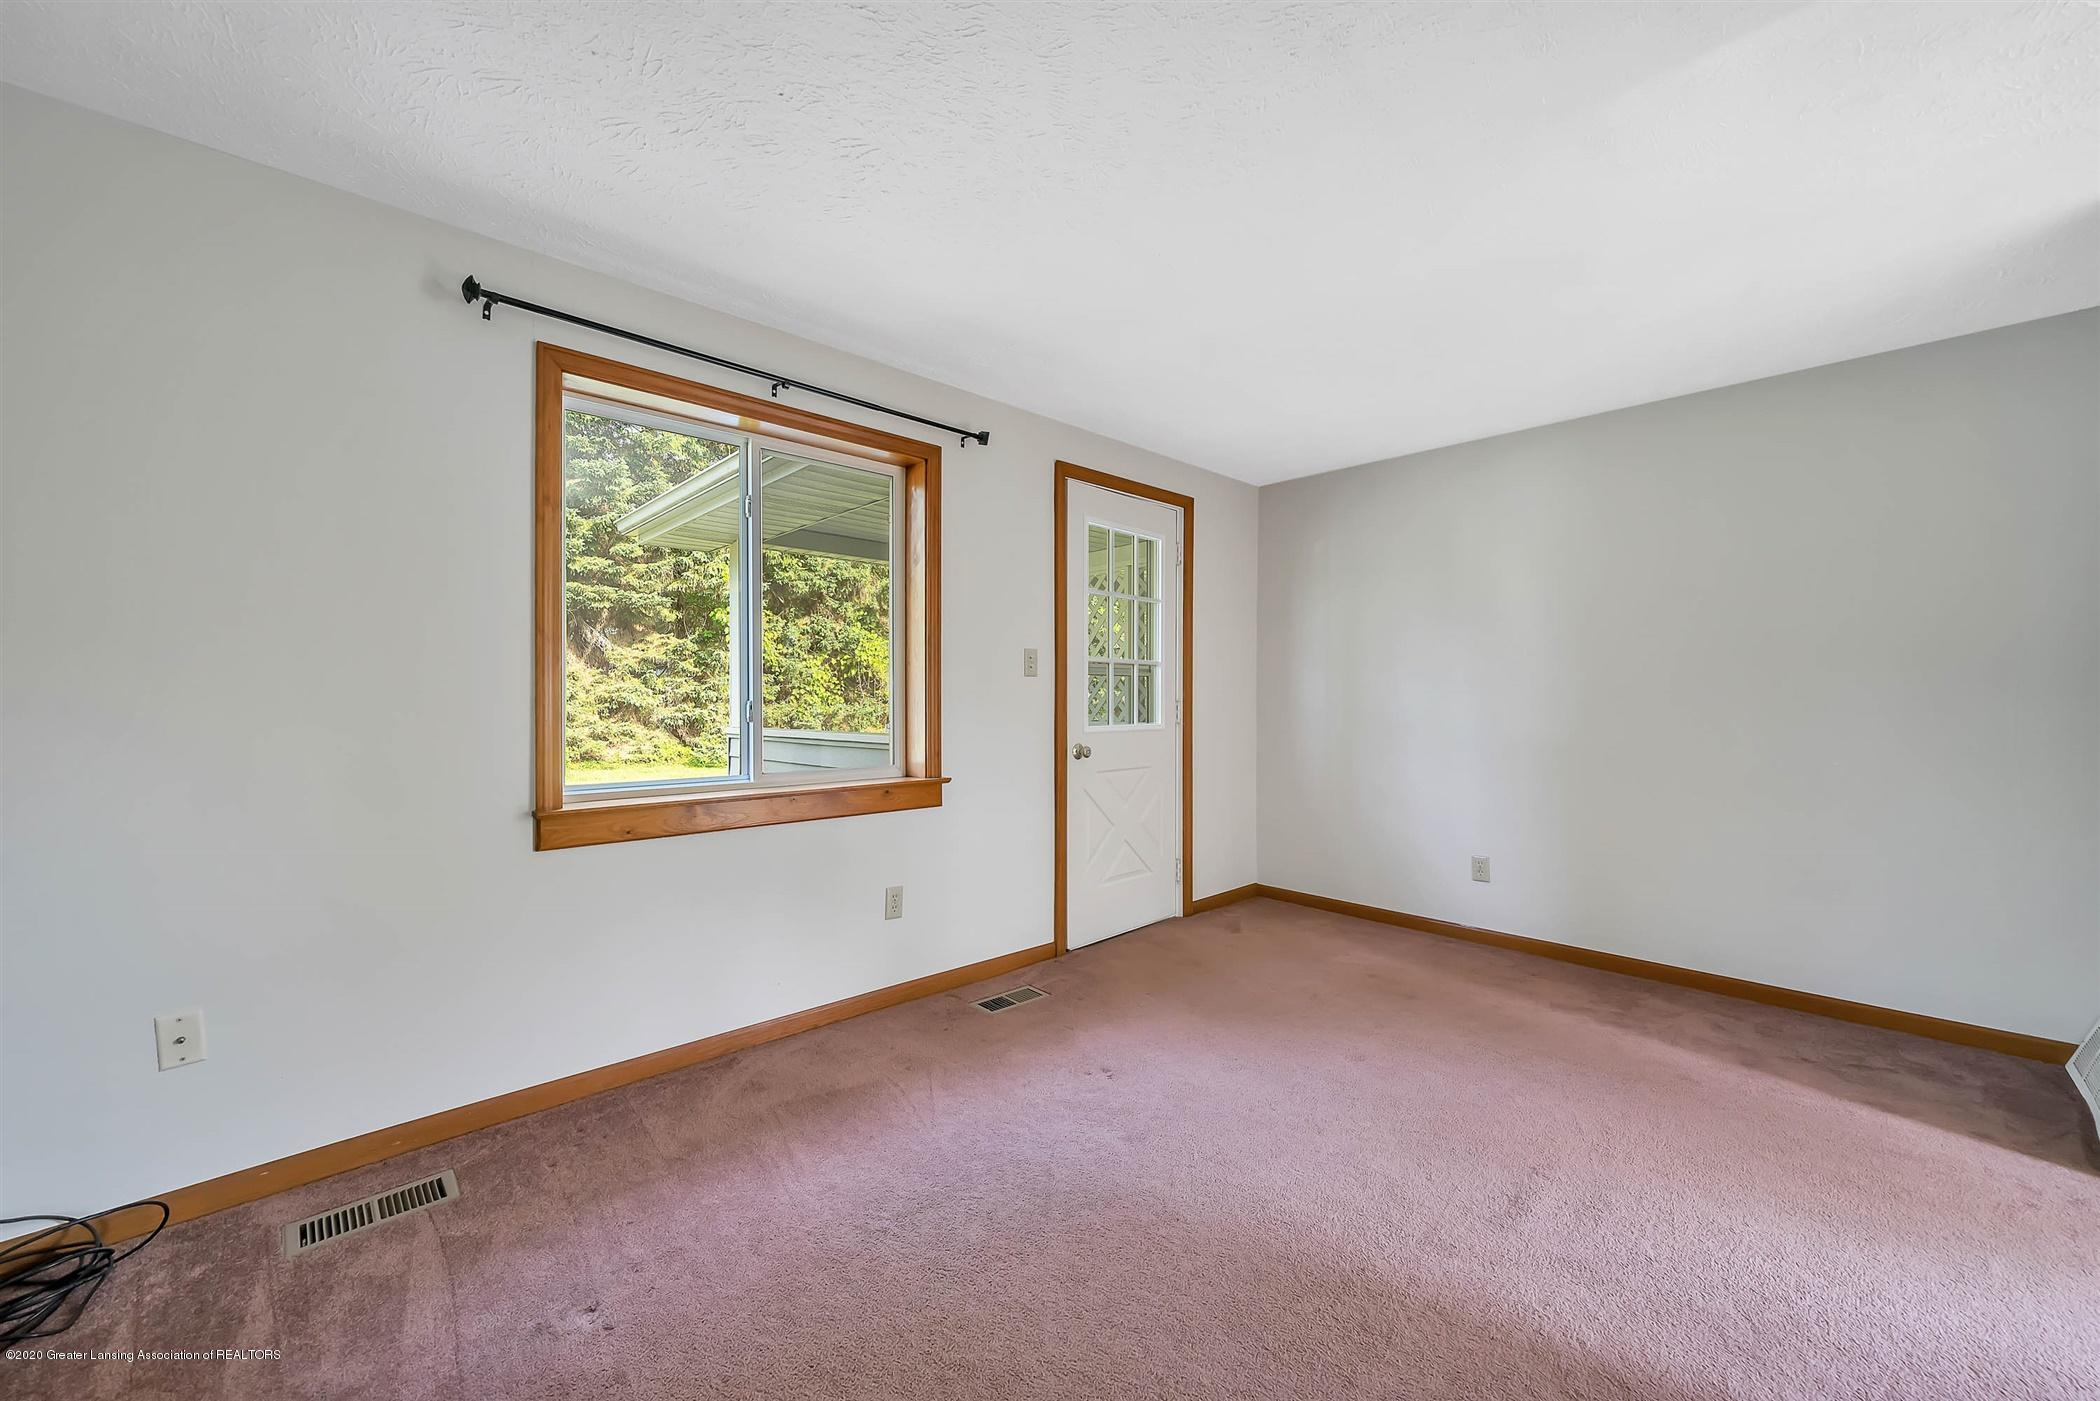 6750 W Lovejoy Rd - (21) 6756 Lovejoy Living Room - 21